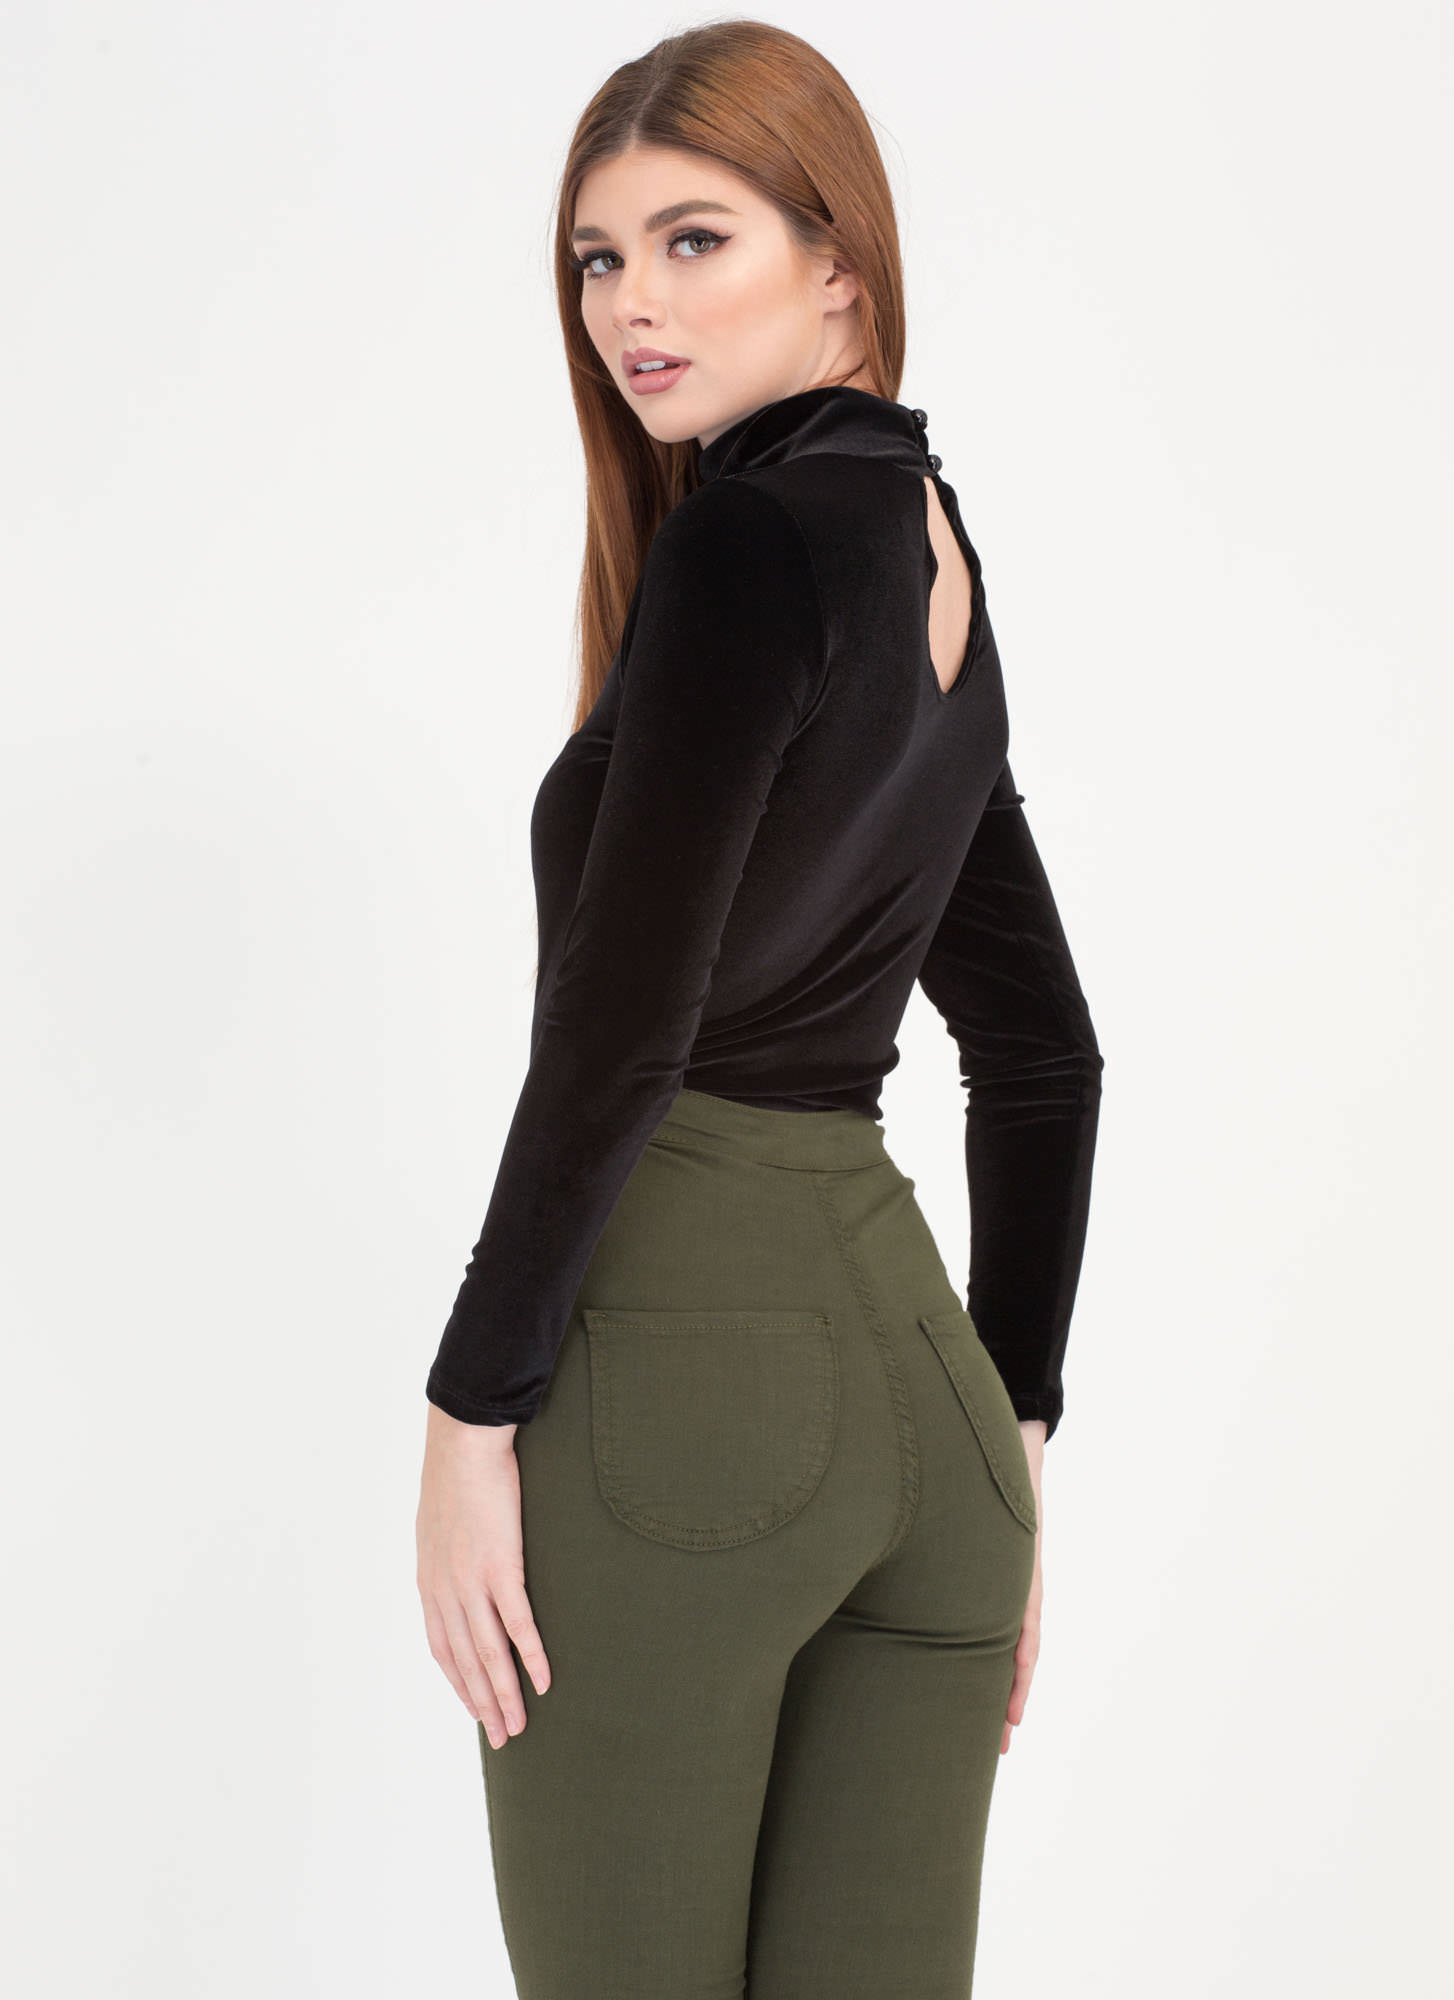 Gojane - Model ID - Bellazon